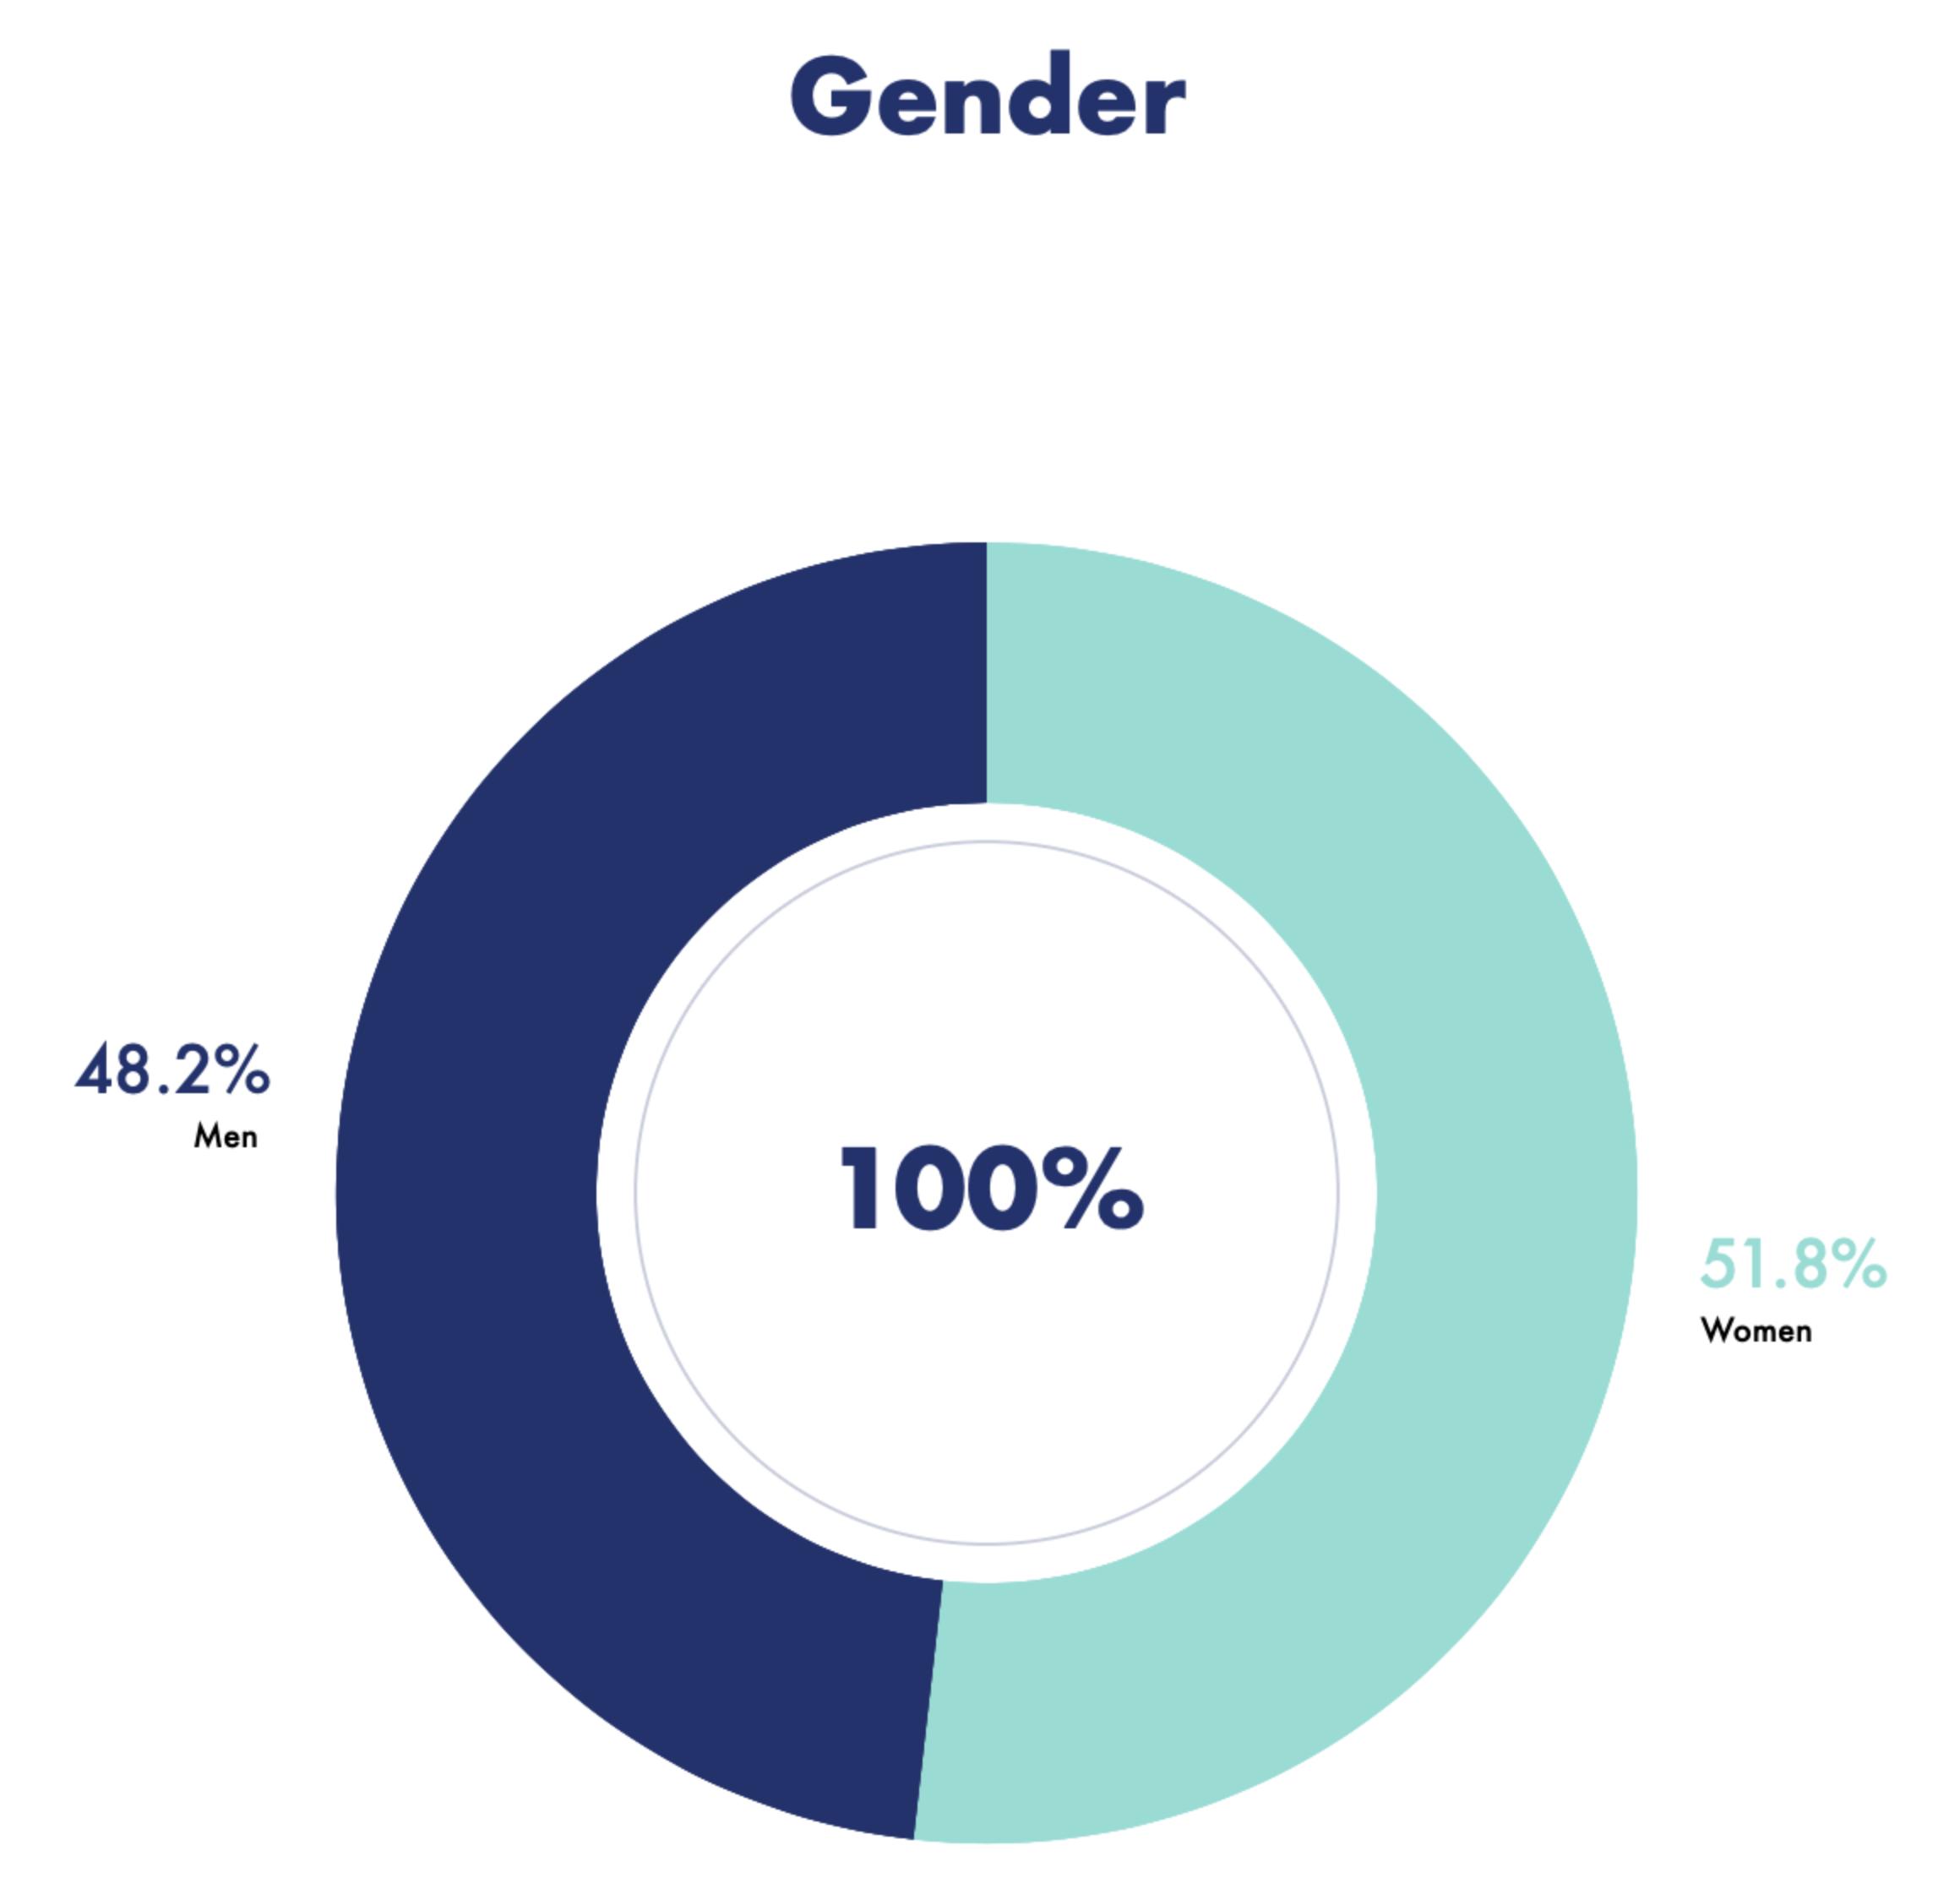 COVID Impact on Employment Survey - Gender